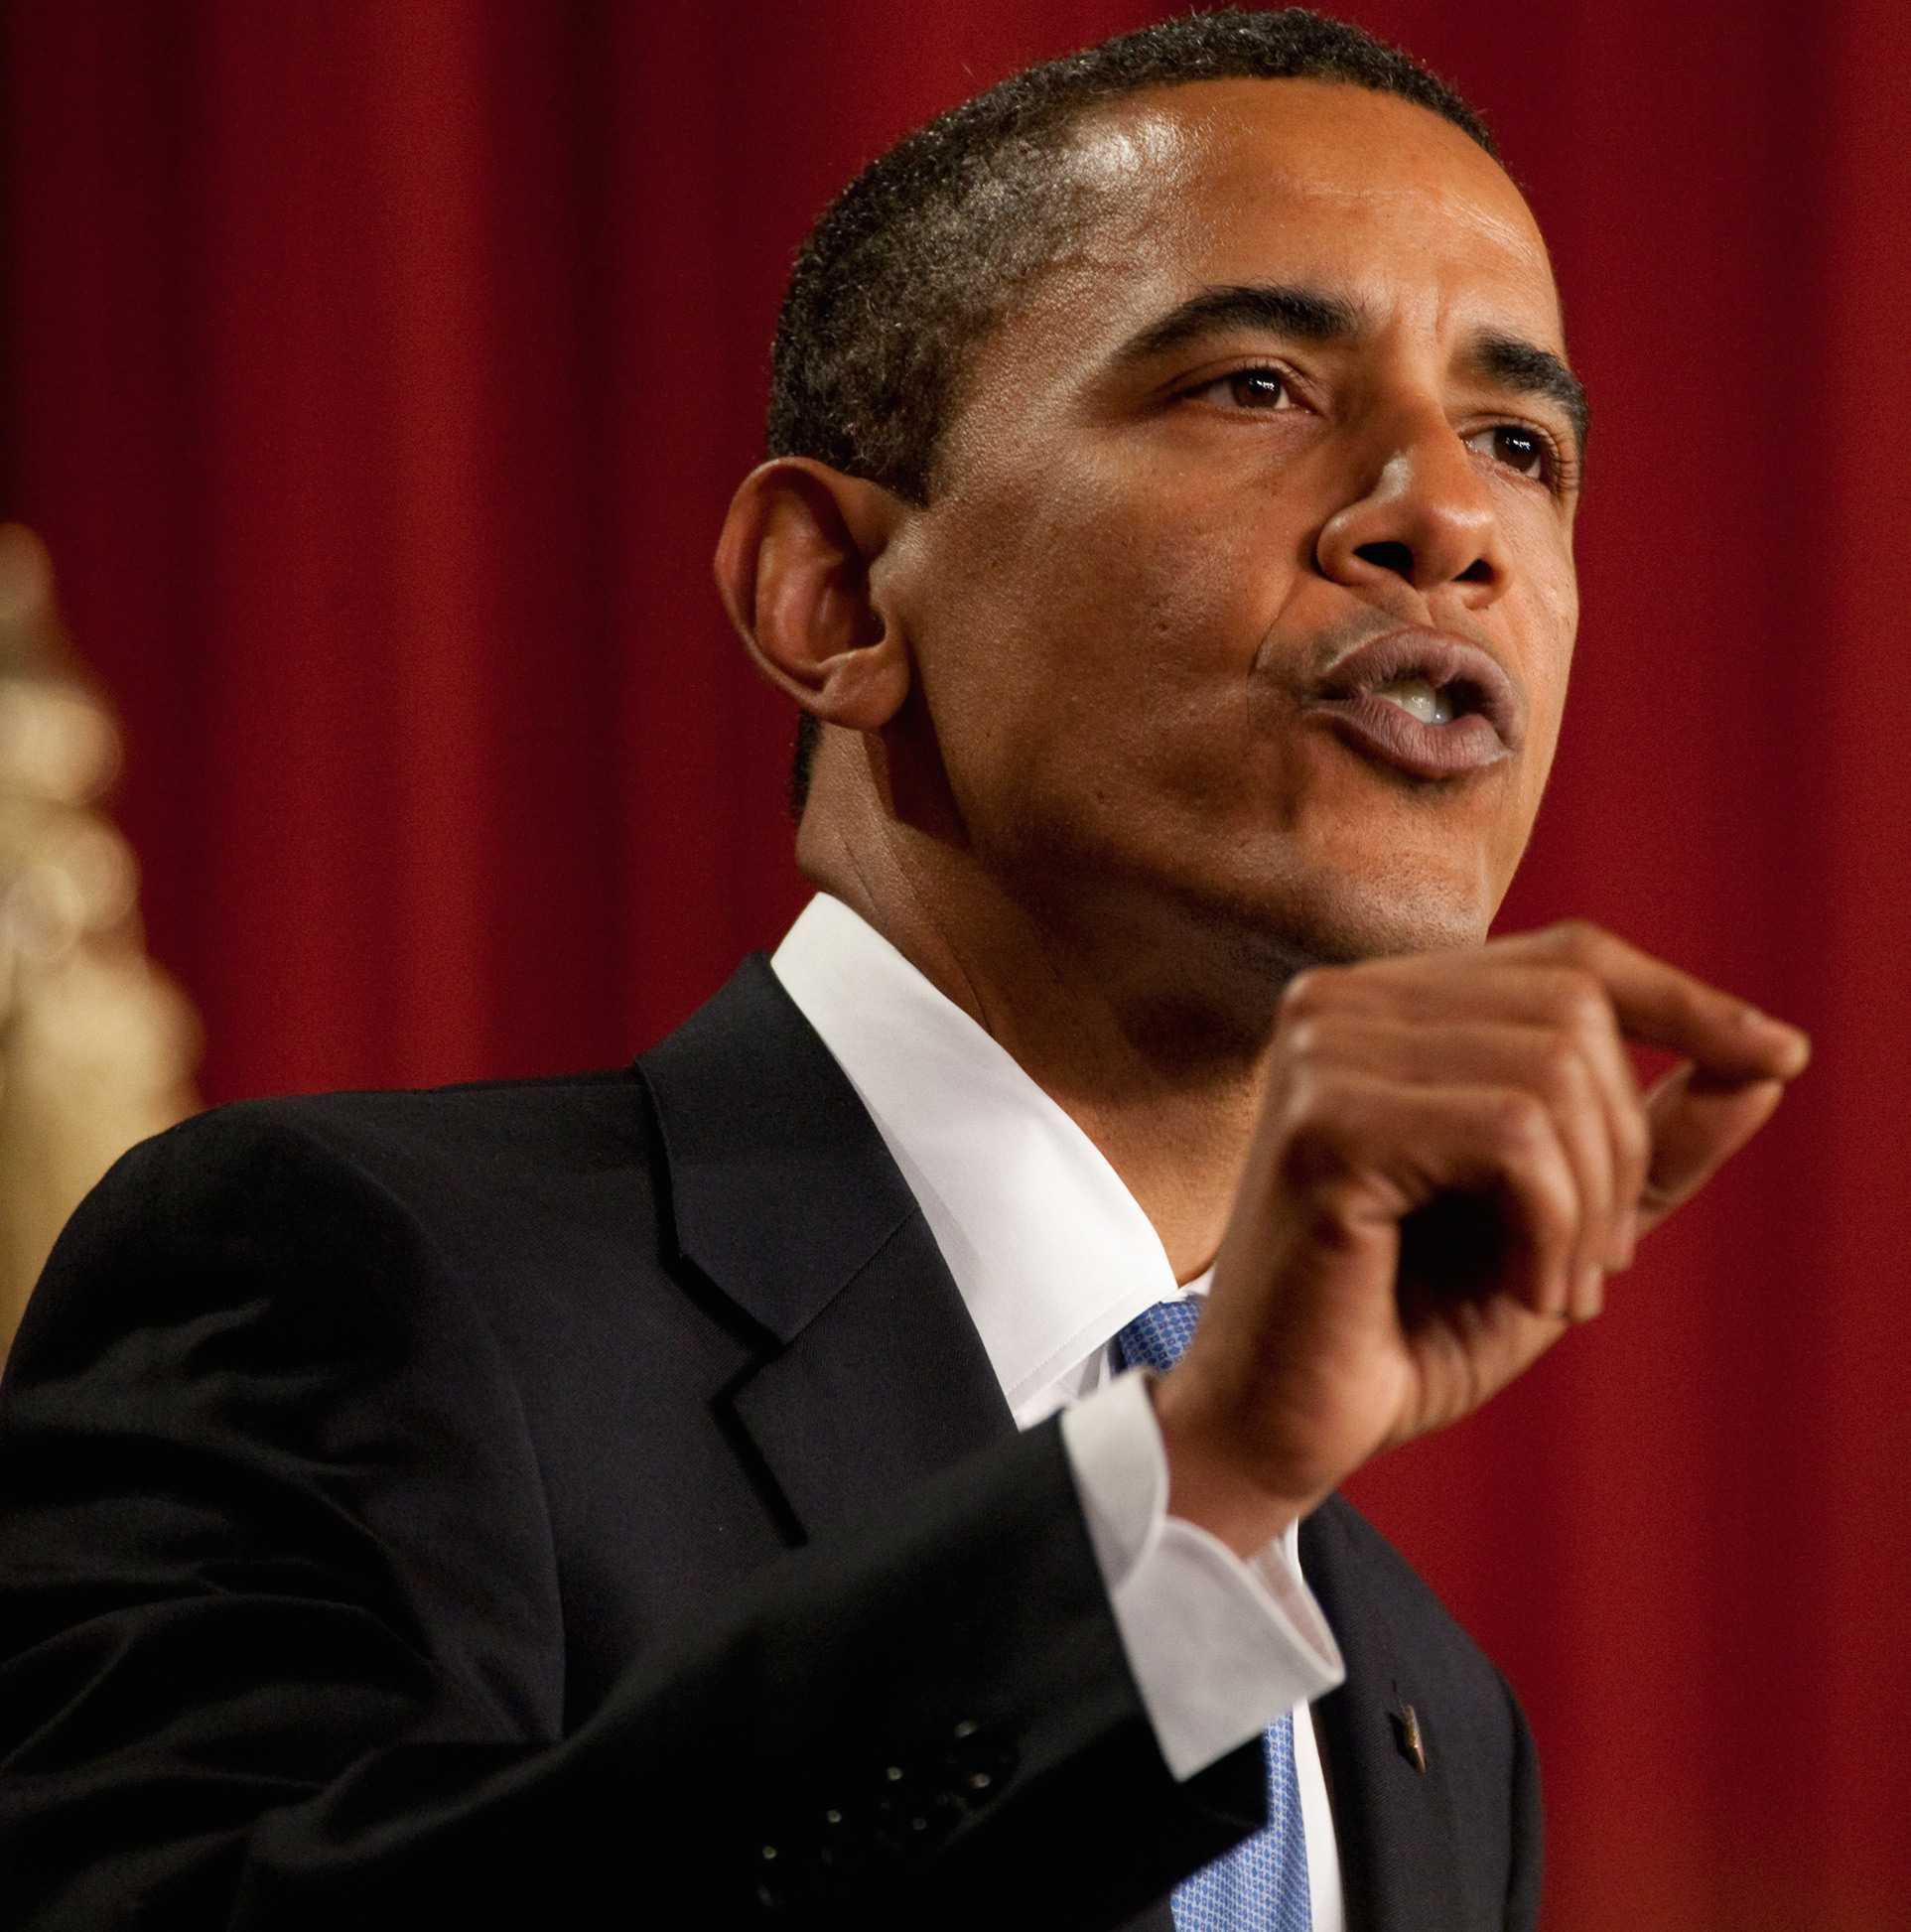 Obama Housing Plan Qualifications 28 Images Obama